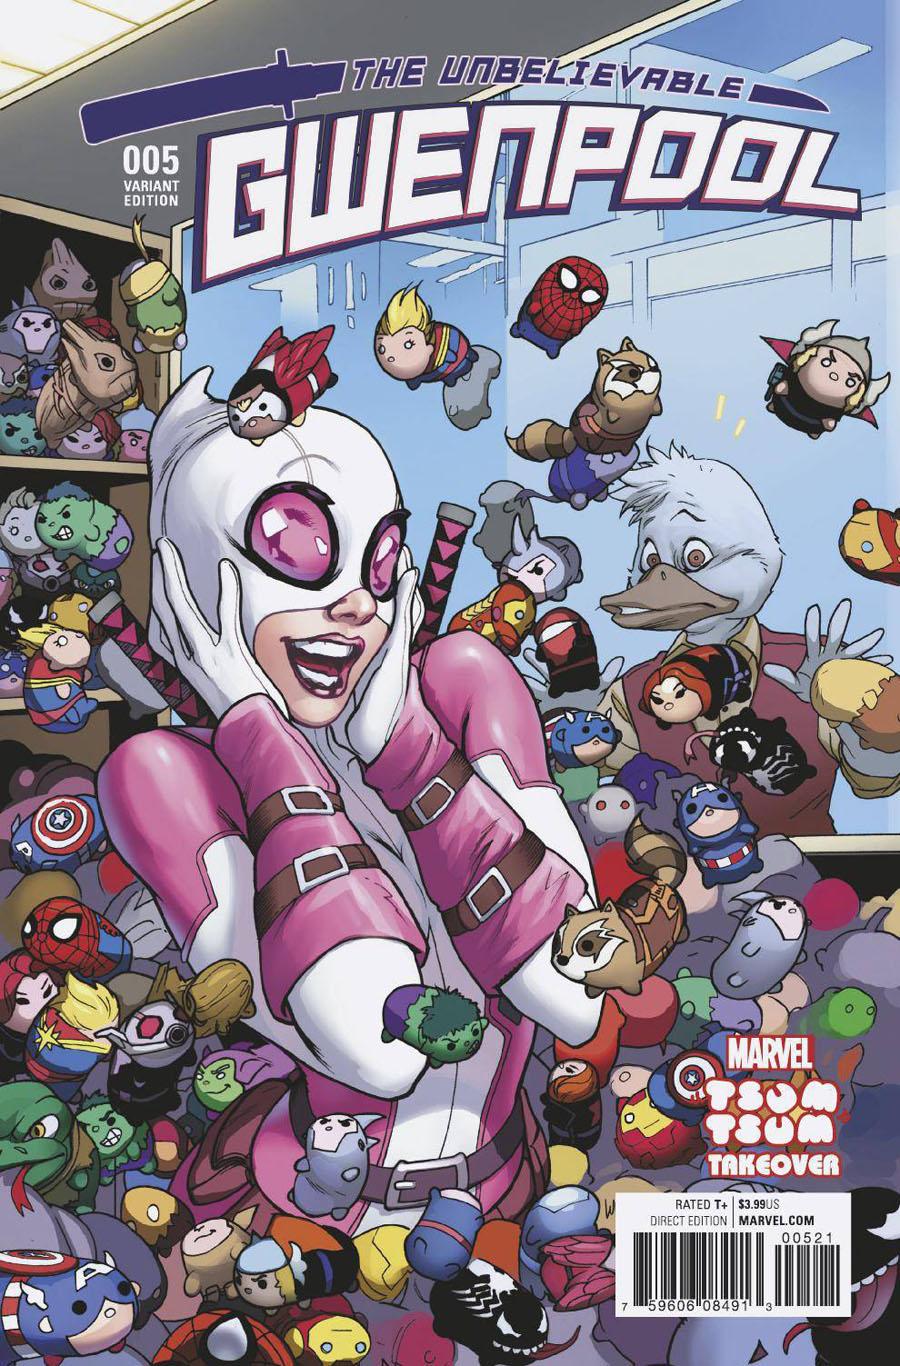 Gwenpool #5 Cover B Variant Emanuela Lupacchino Marvel Tsum Tsum Takeover Cover